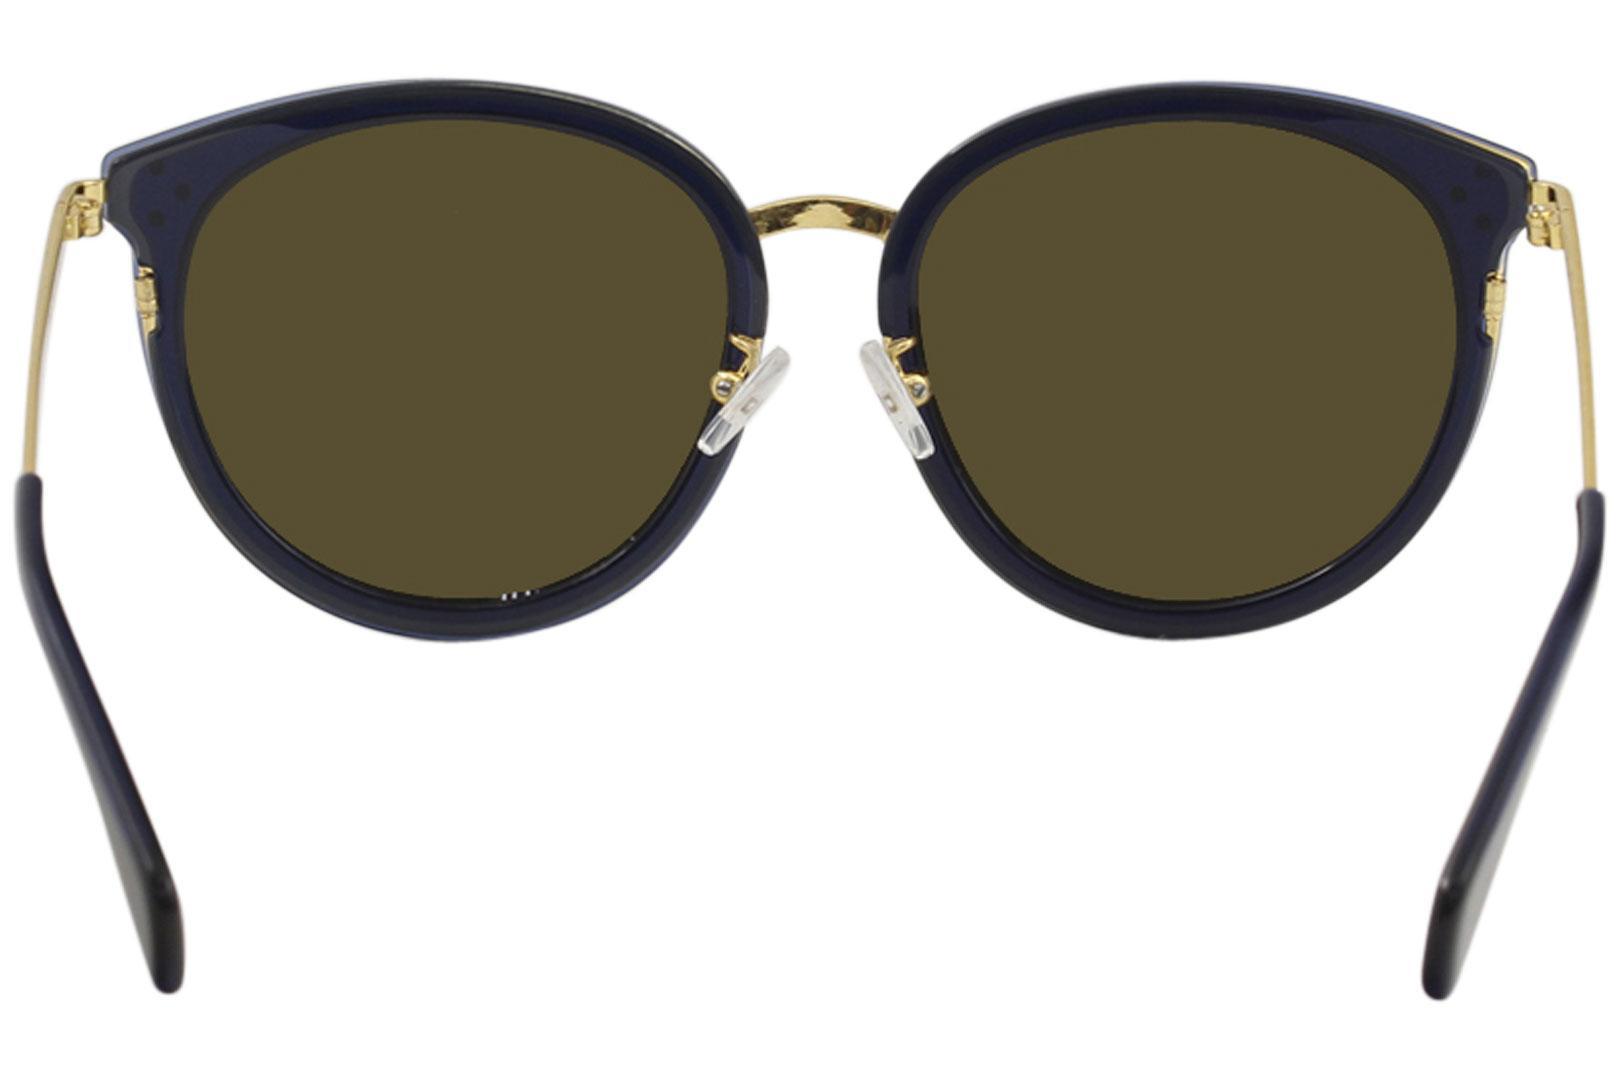 83faac7c9ef Celine Women s CL40033F CL 40033 F Fashion Round Sunglasses